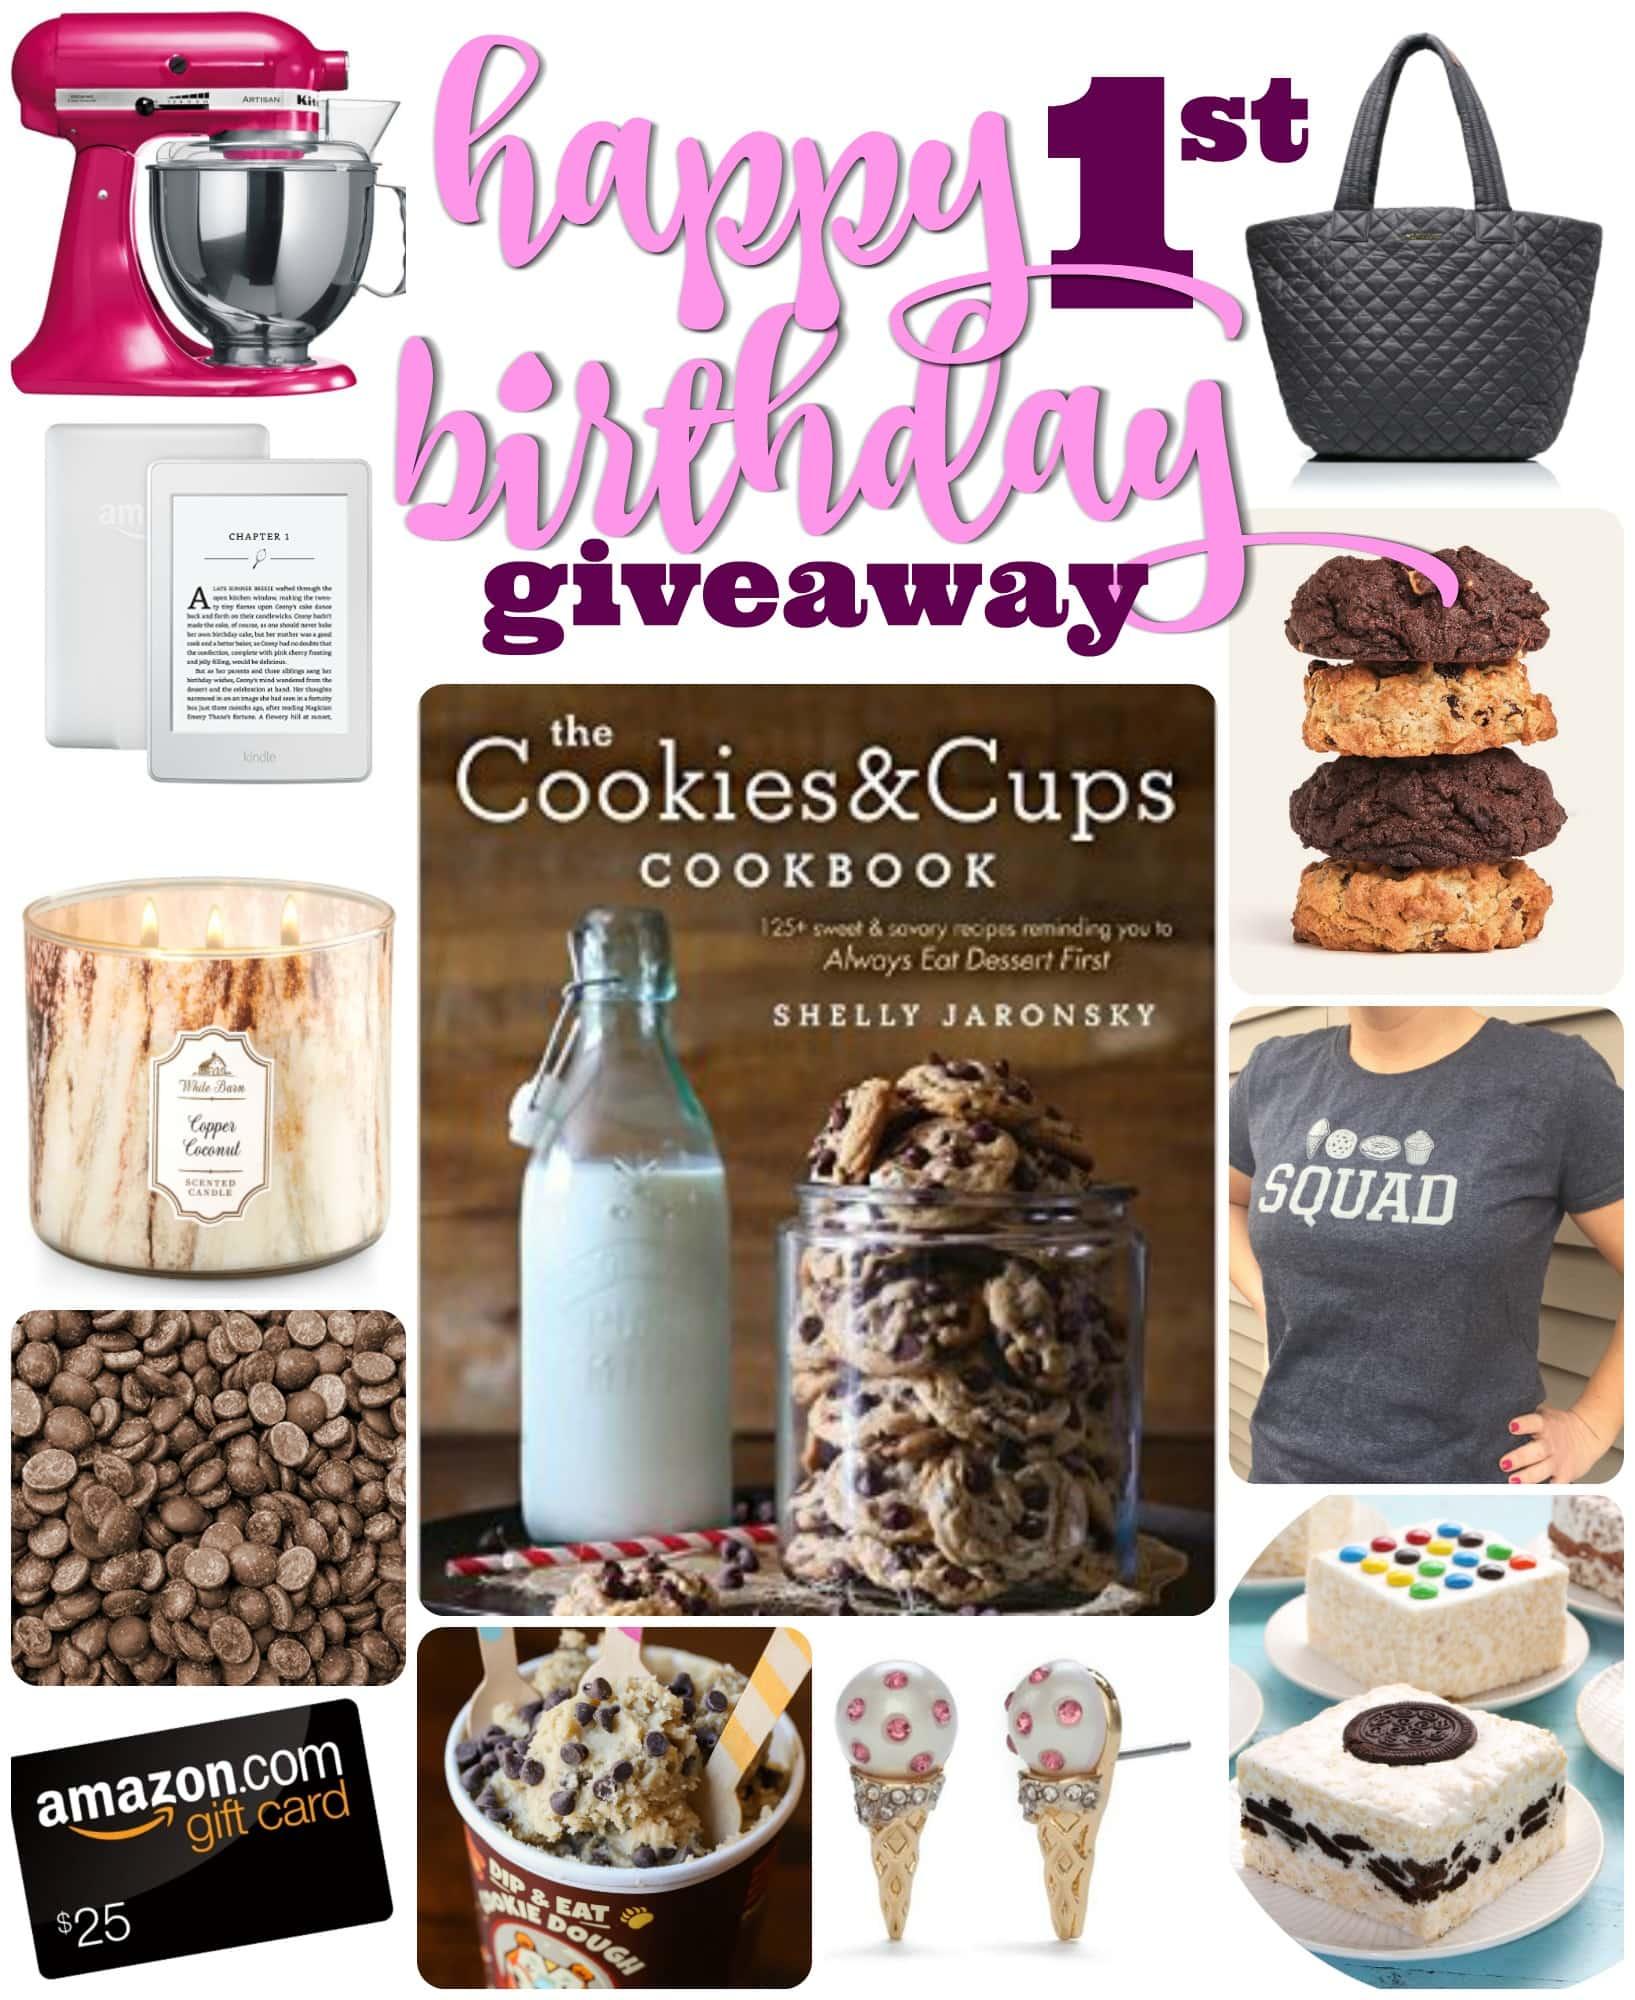 Happy Birthday Cookies & Cups Cookbook!